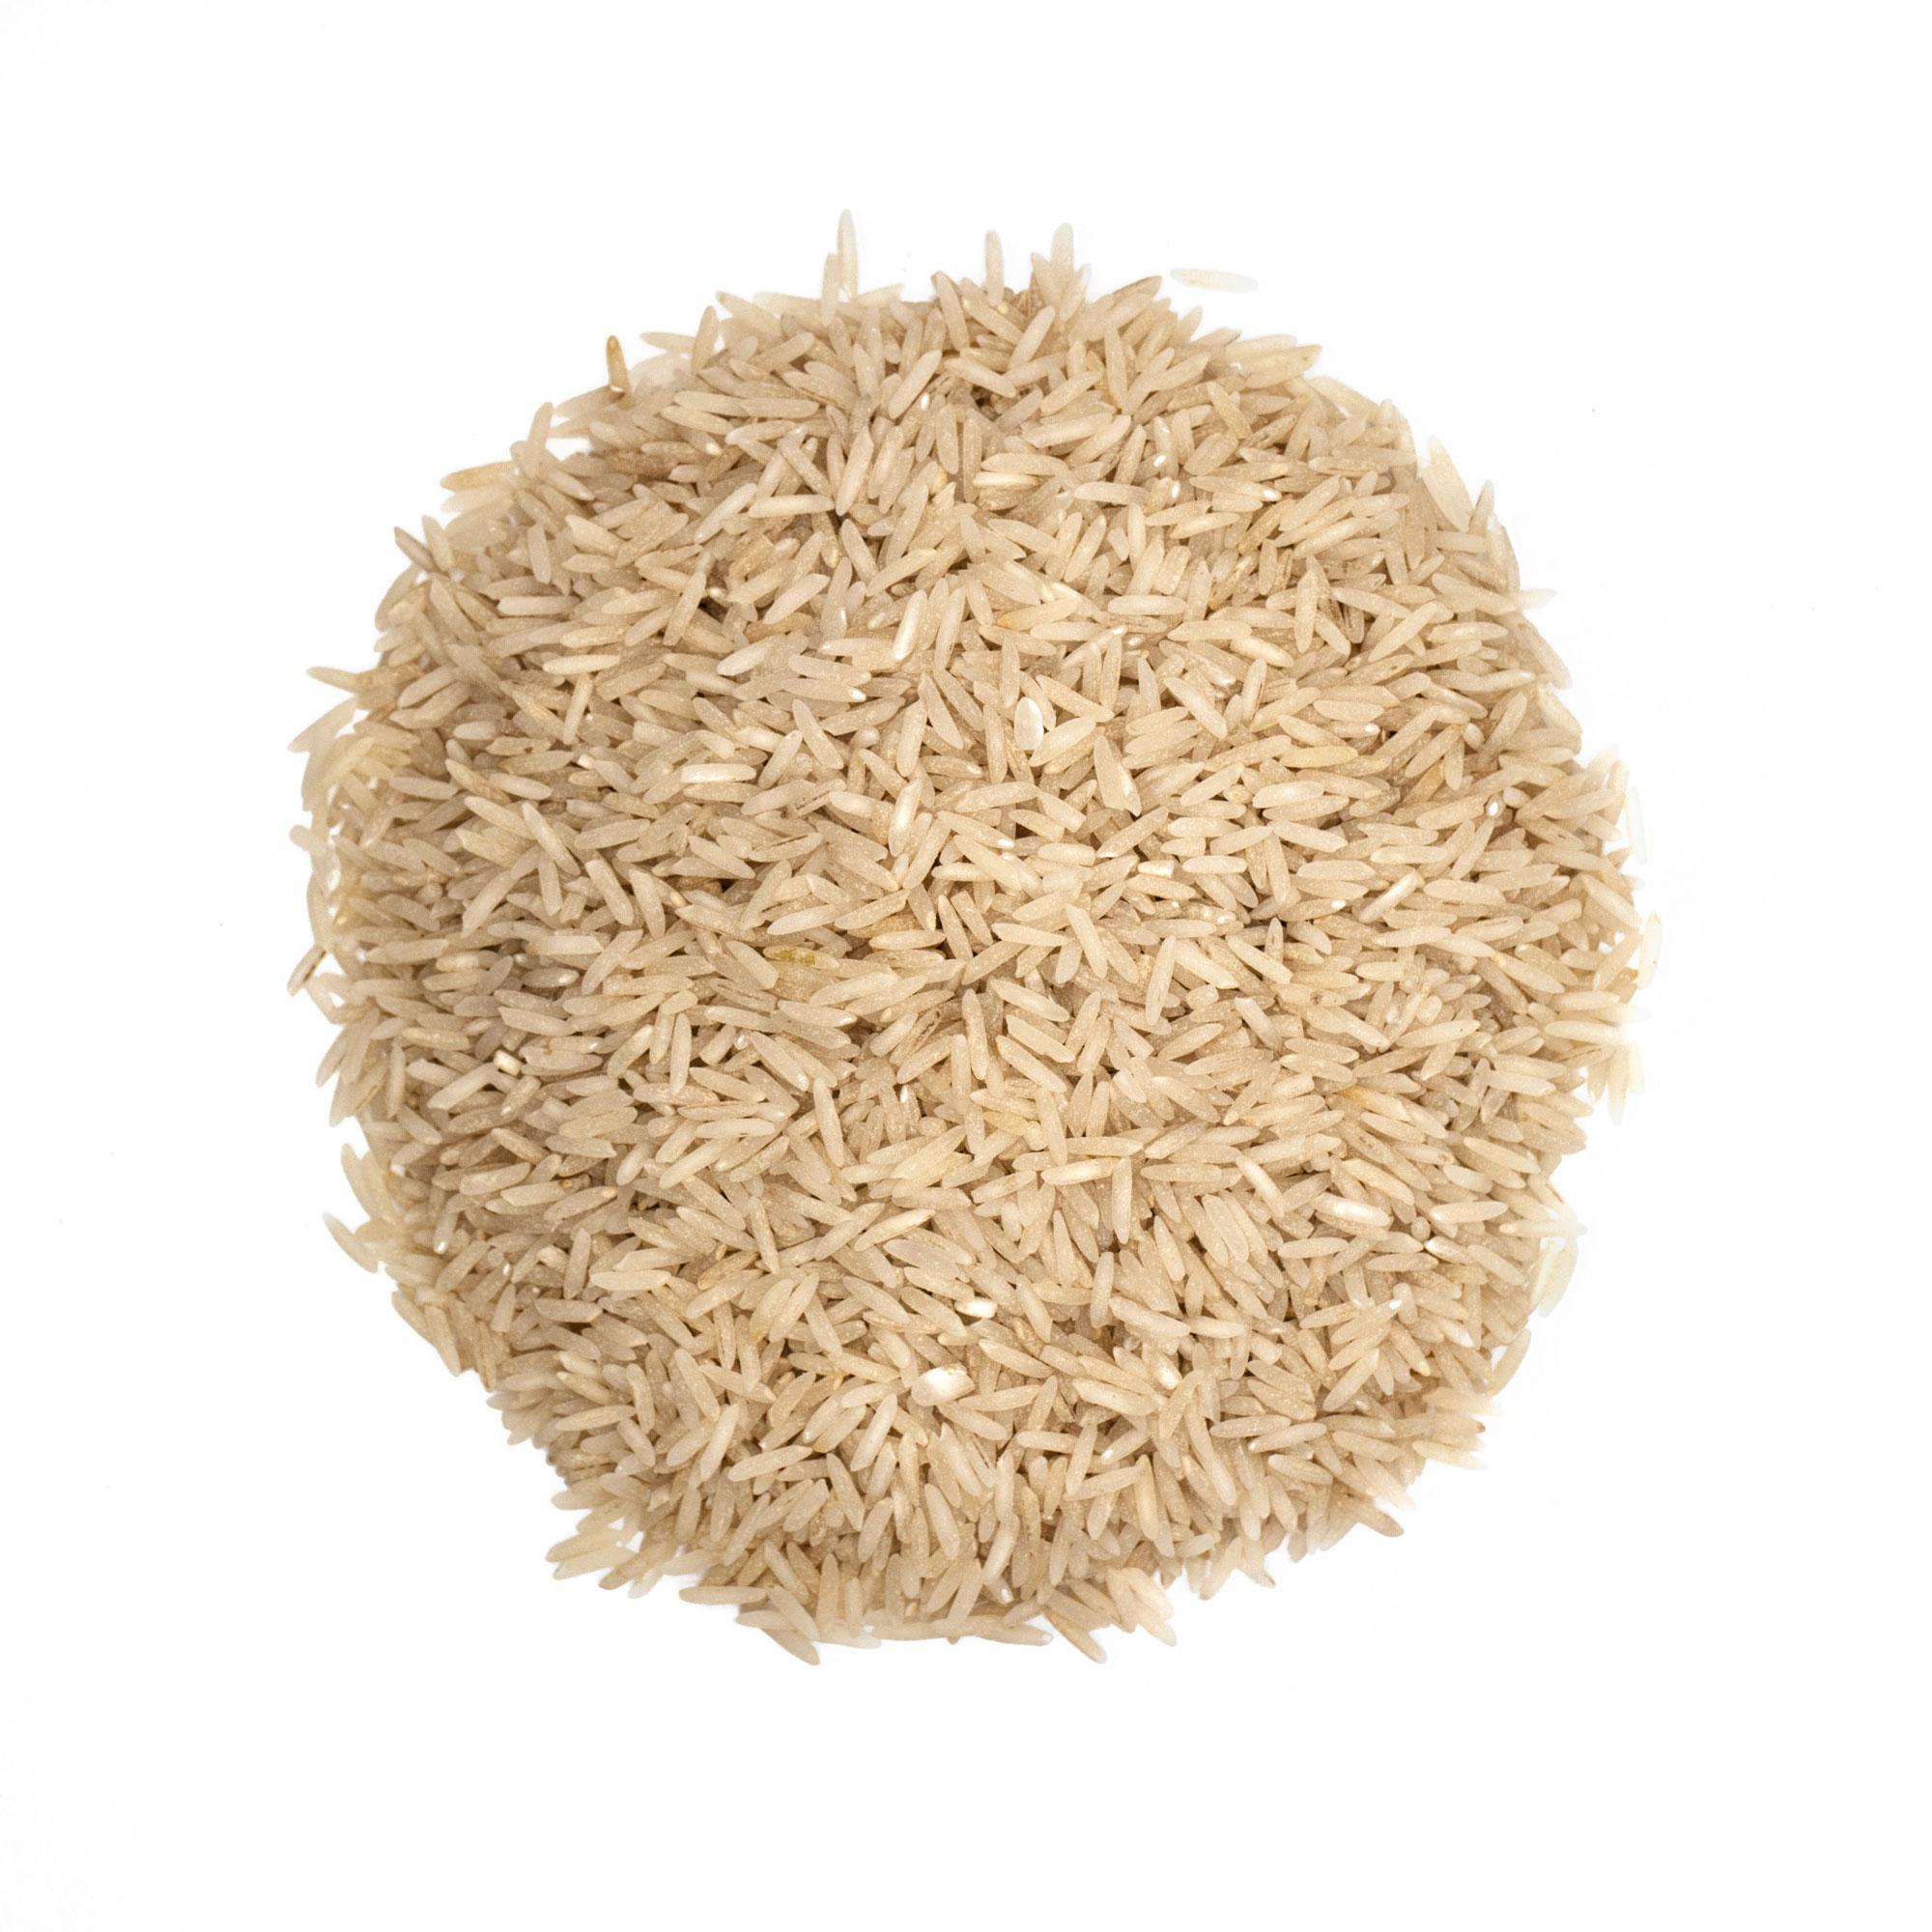 img-la-fourche-1kg-de-riz-basmati-semi-complet-en-vrac-bio